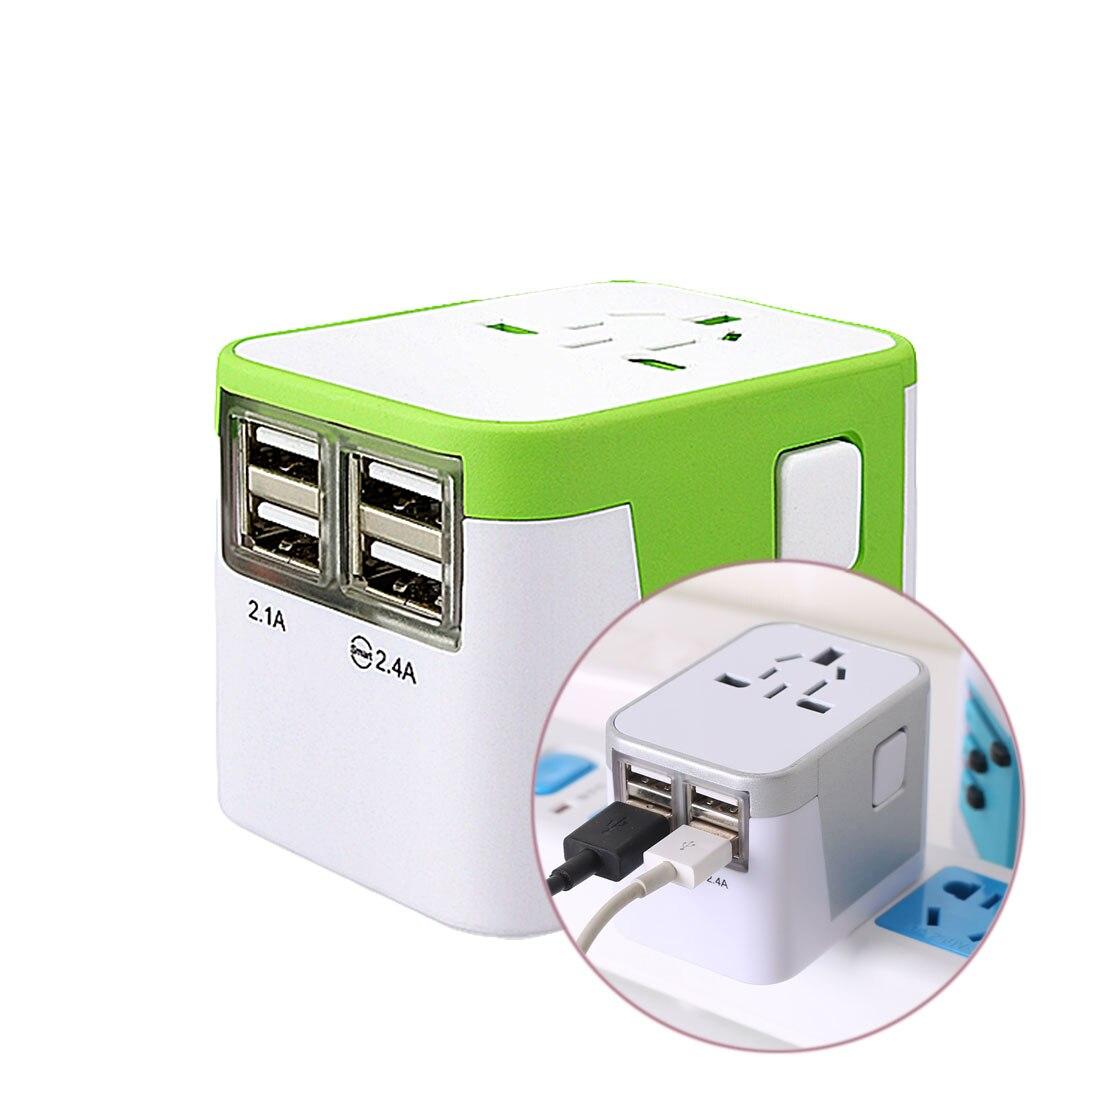 Marsnaska 4 USB Port All in One Universal International Plug Adapter World Travel AC Power Charger Adaptor with AU US UK EU Plug